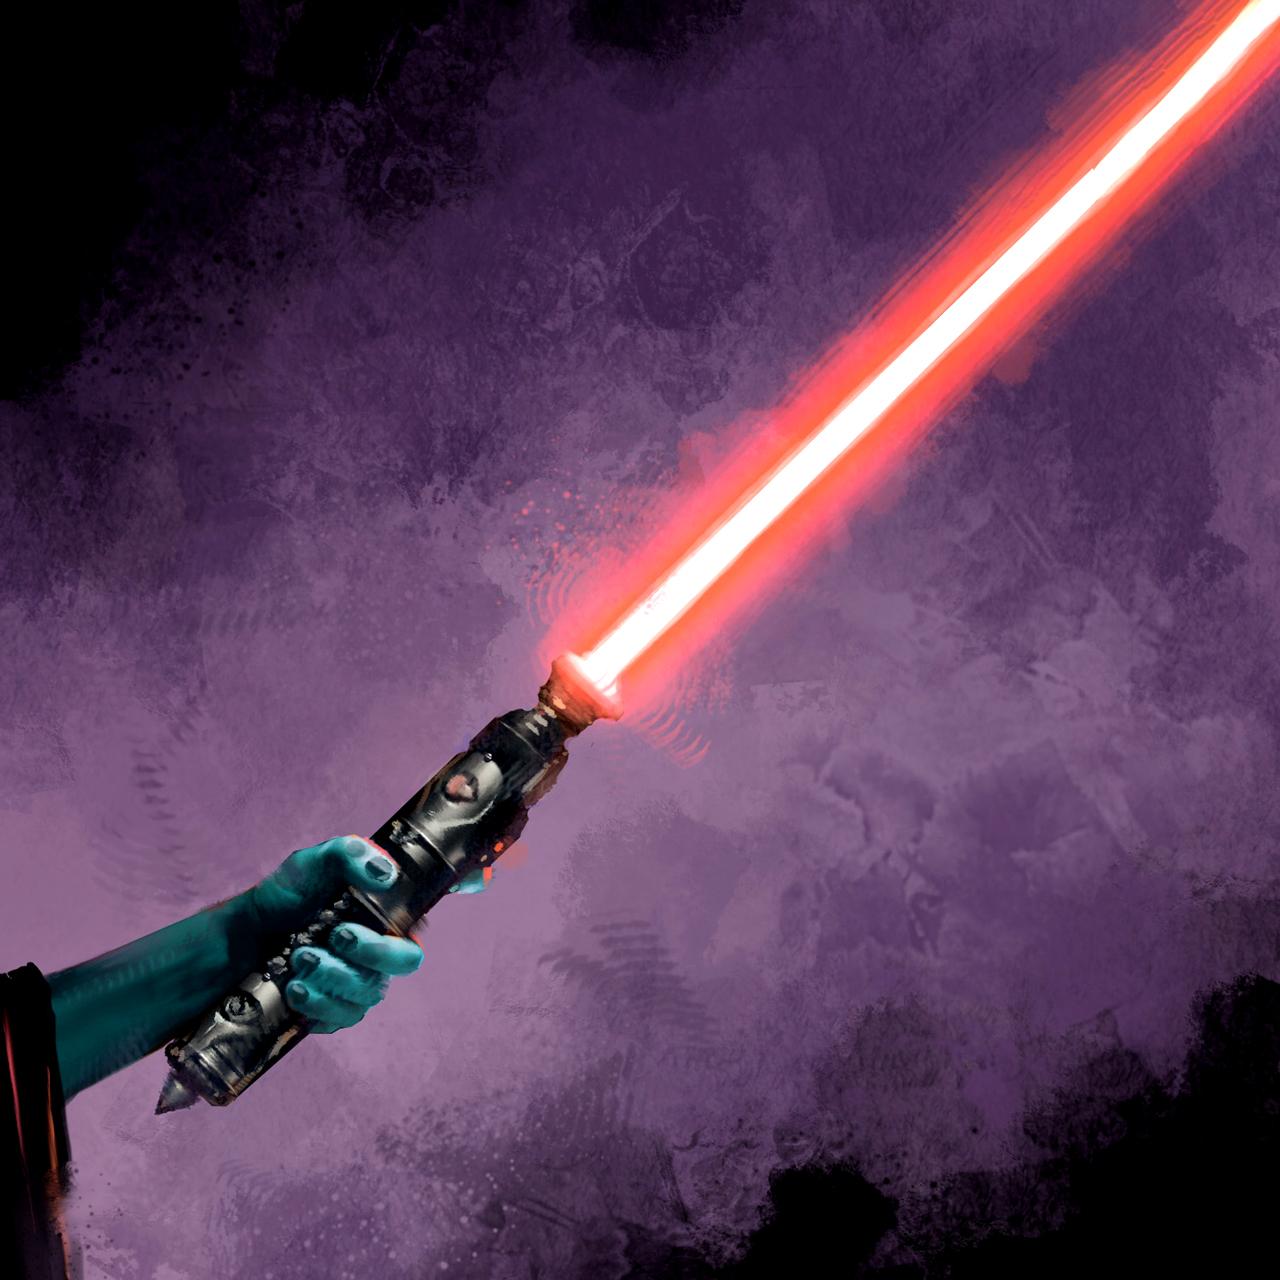 Sith lightsaber | Wookieepedia | FANDOM powered by Wikia